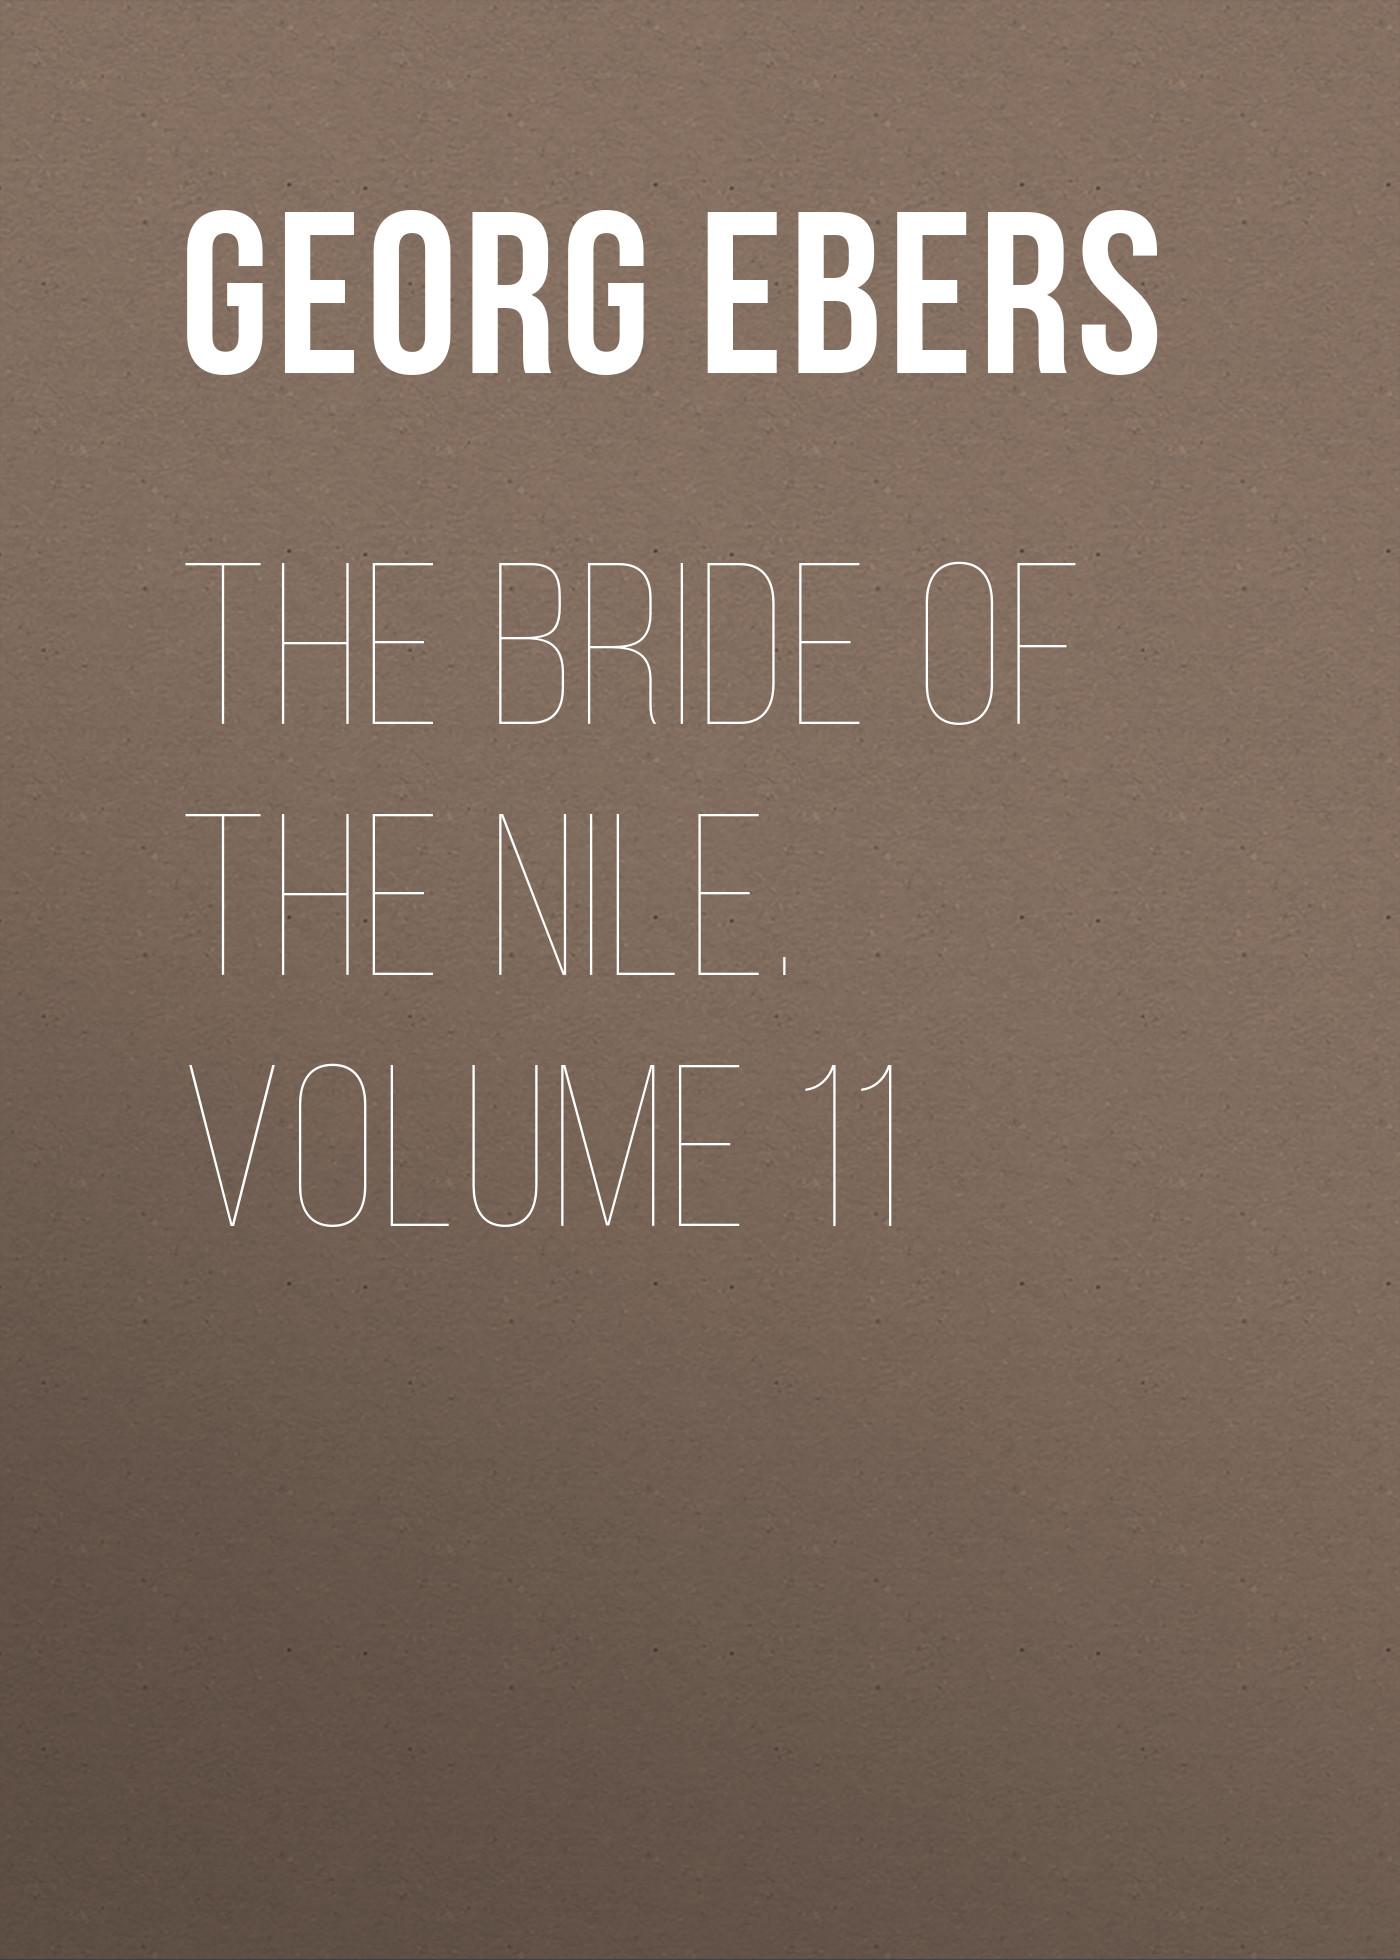 Georg Ebers The Bride of the Nile. Volume 11 gervinus georg gottfried the art of drinking